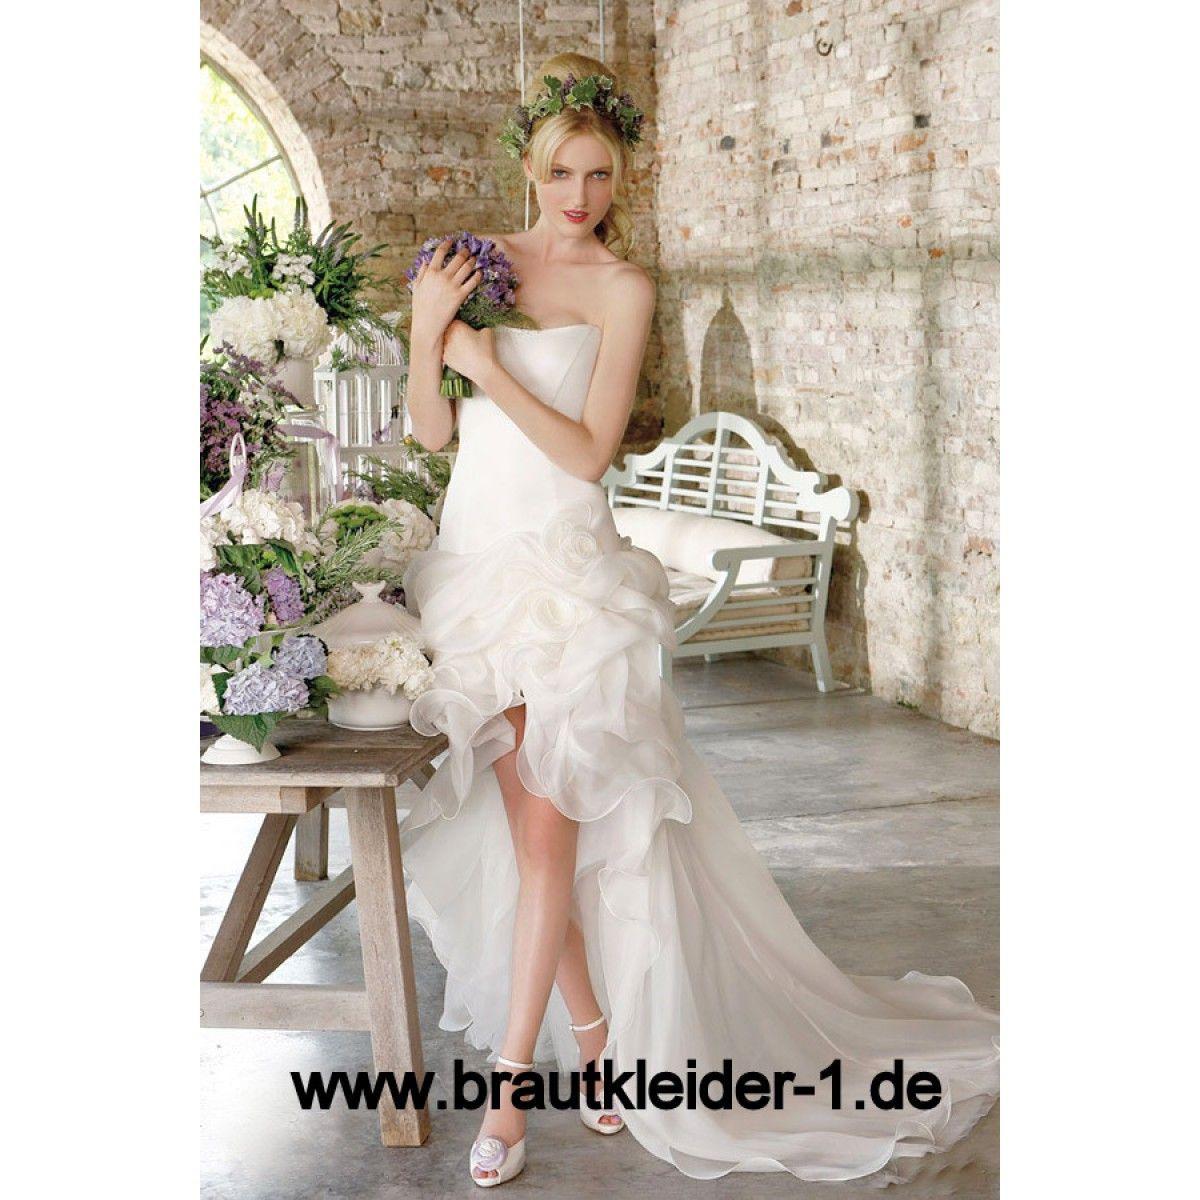 Bustie Brautkleid Agascha Vorne Kurz Hinten Lang